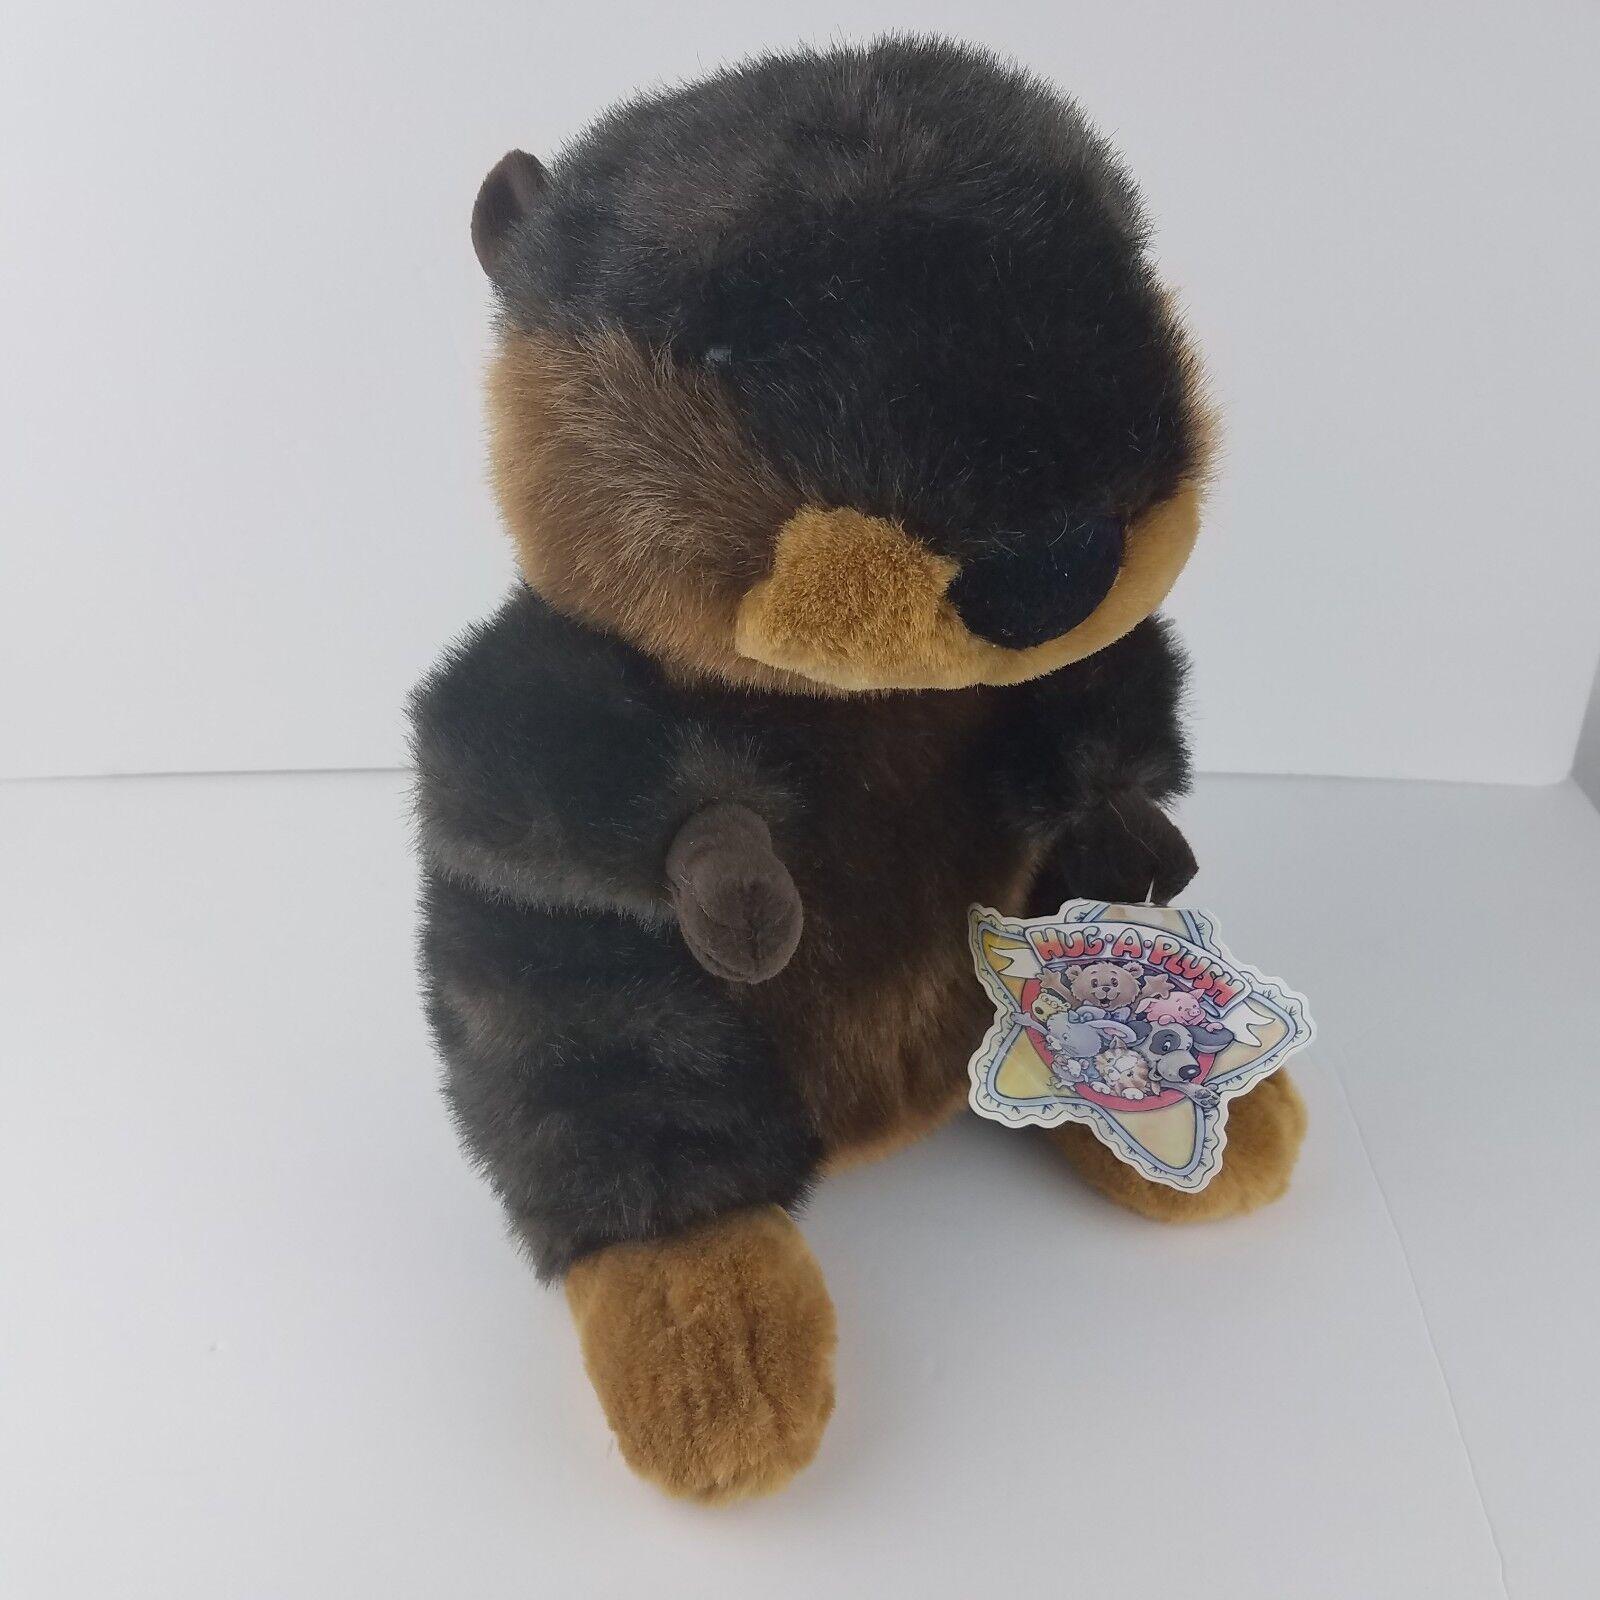 Commonwealth Toys Beaver Plush Stuffed Animal 15  Brown RARE HUG A PLUSH w TAG